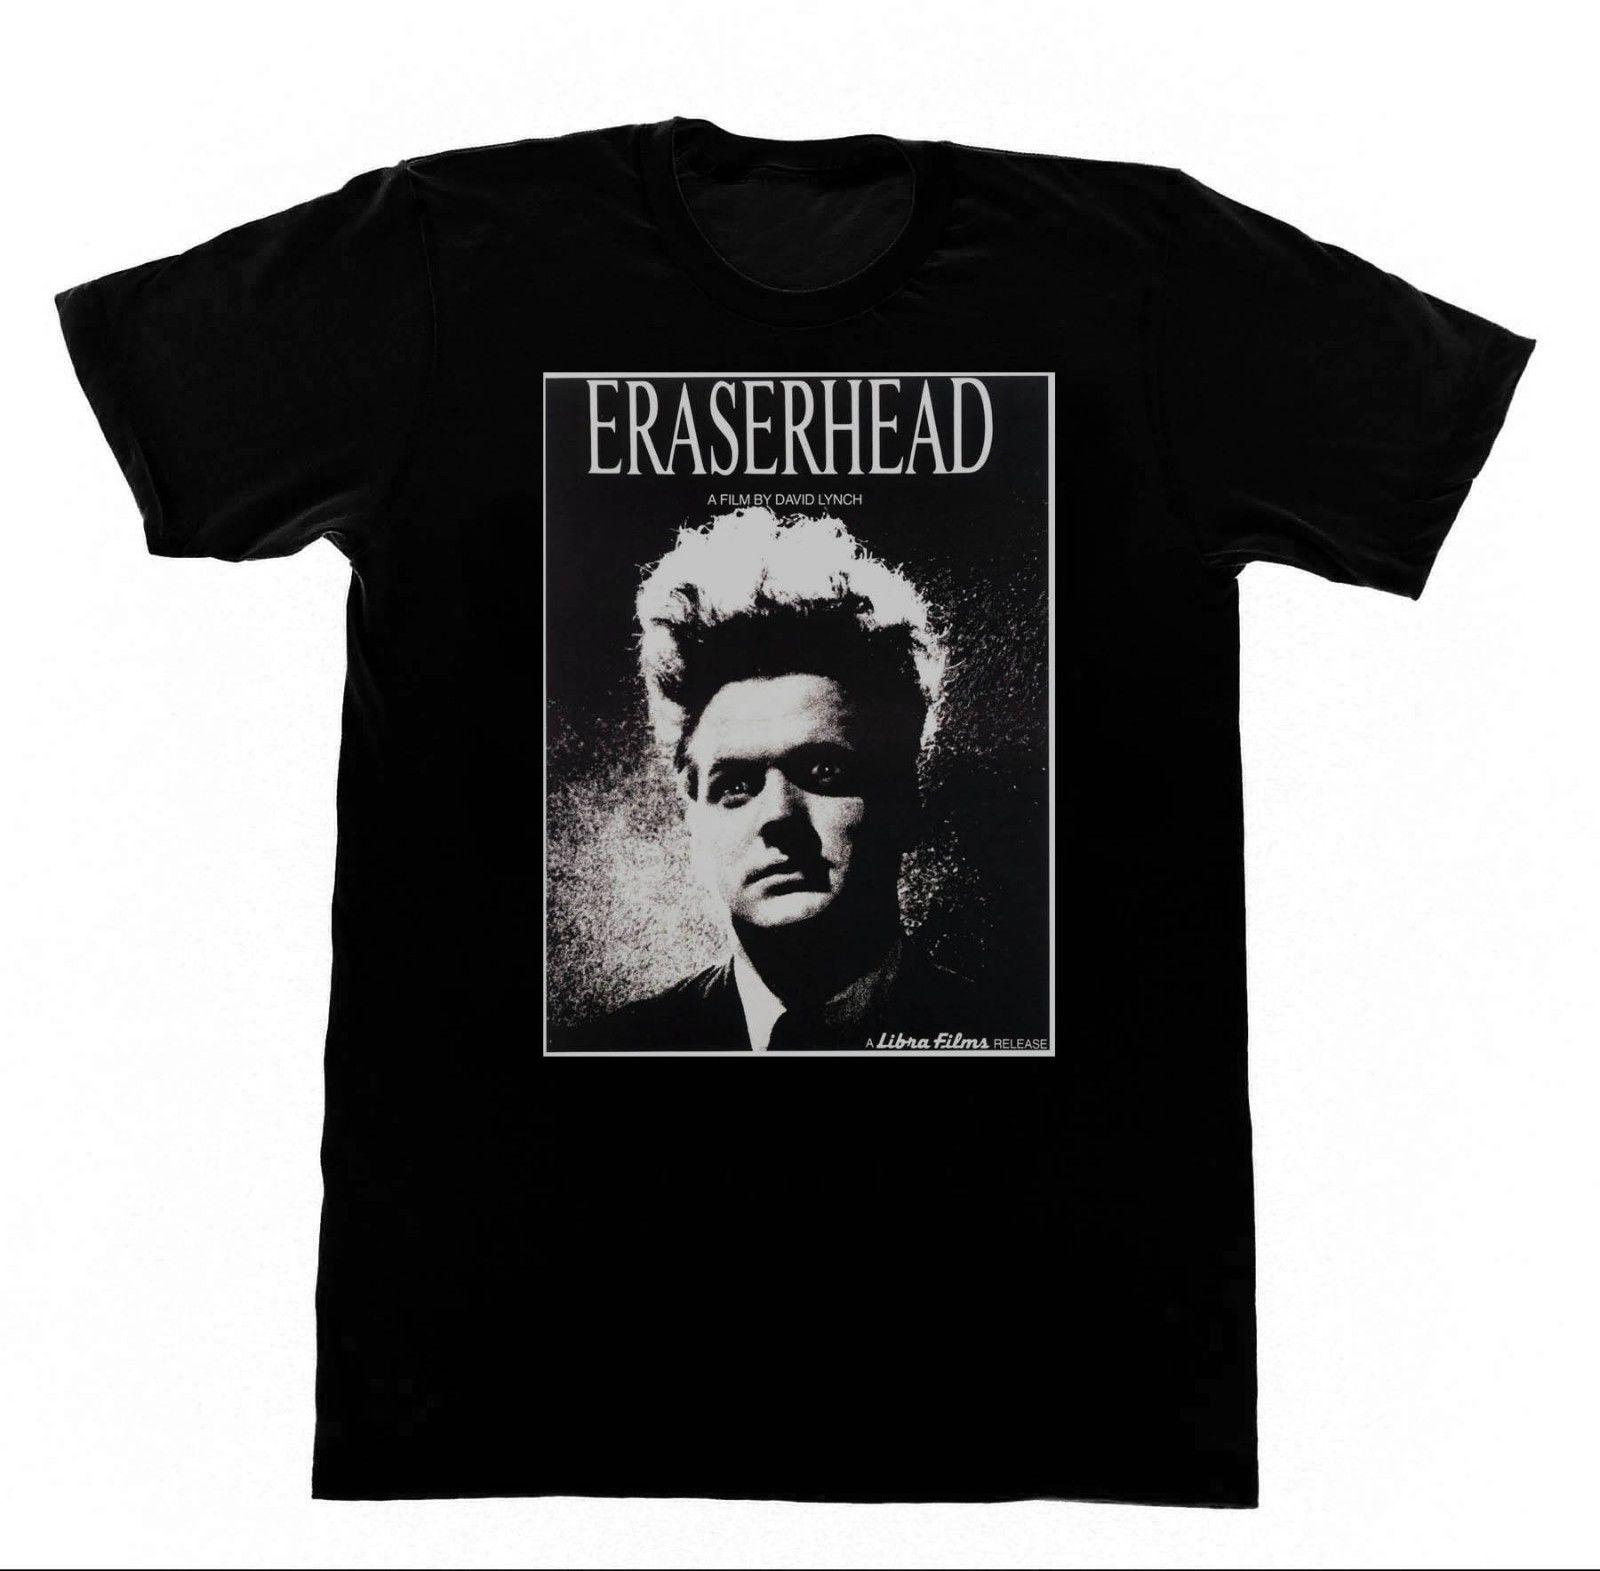 Eraserhead T Shirt 85 Shirt Davidynch Eraser Head Twin Peaks Summer Short Sleeves New Fashion T-Shirt Fashion Style